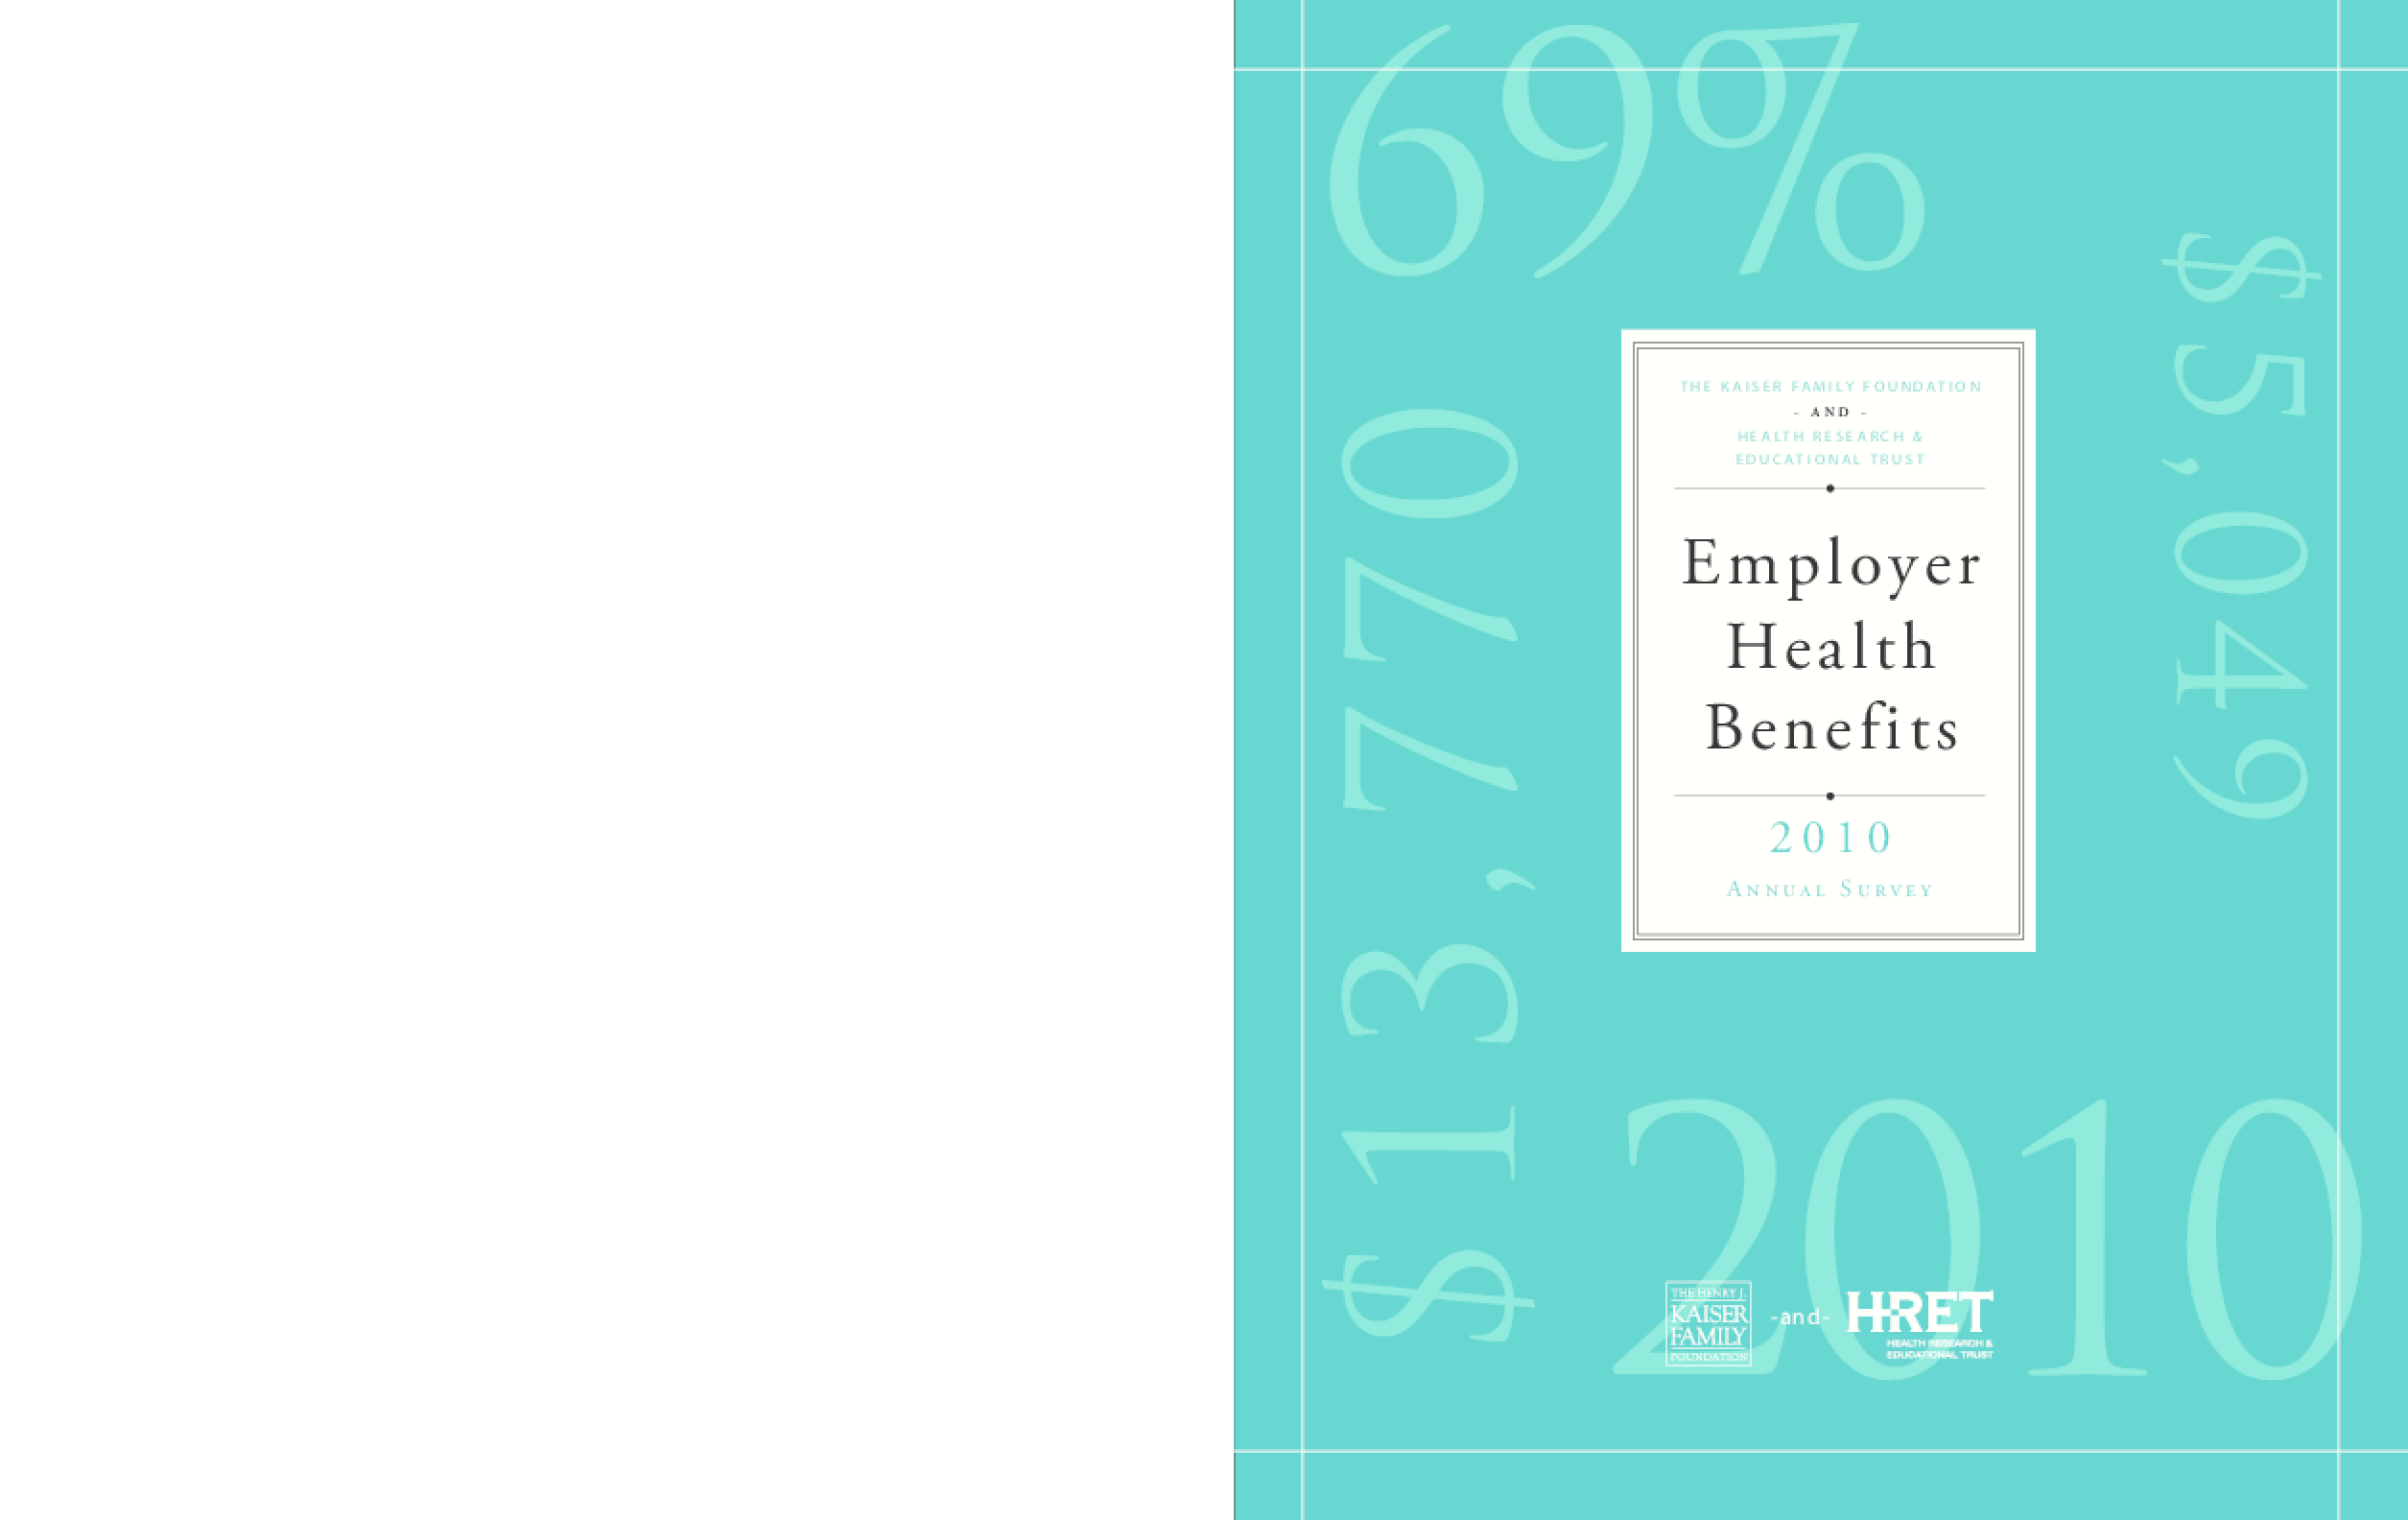 Employer Health Benefits 2010 Annual Survey